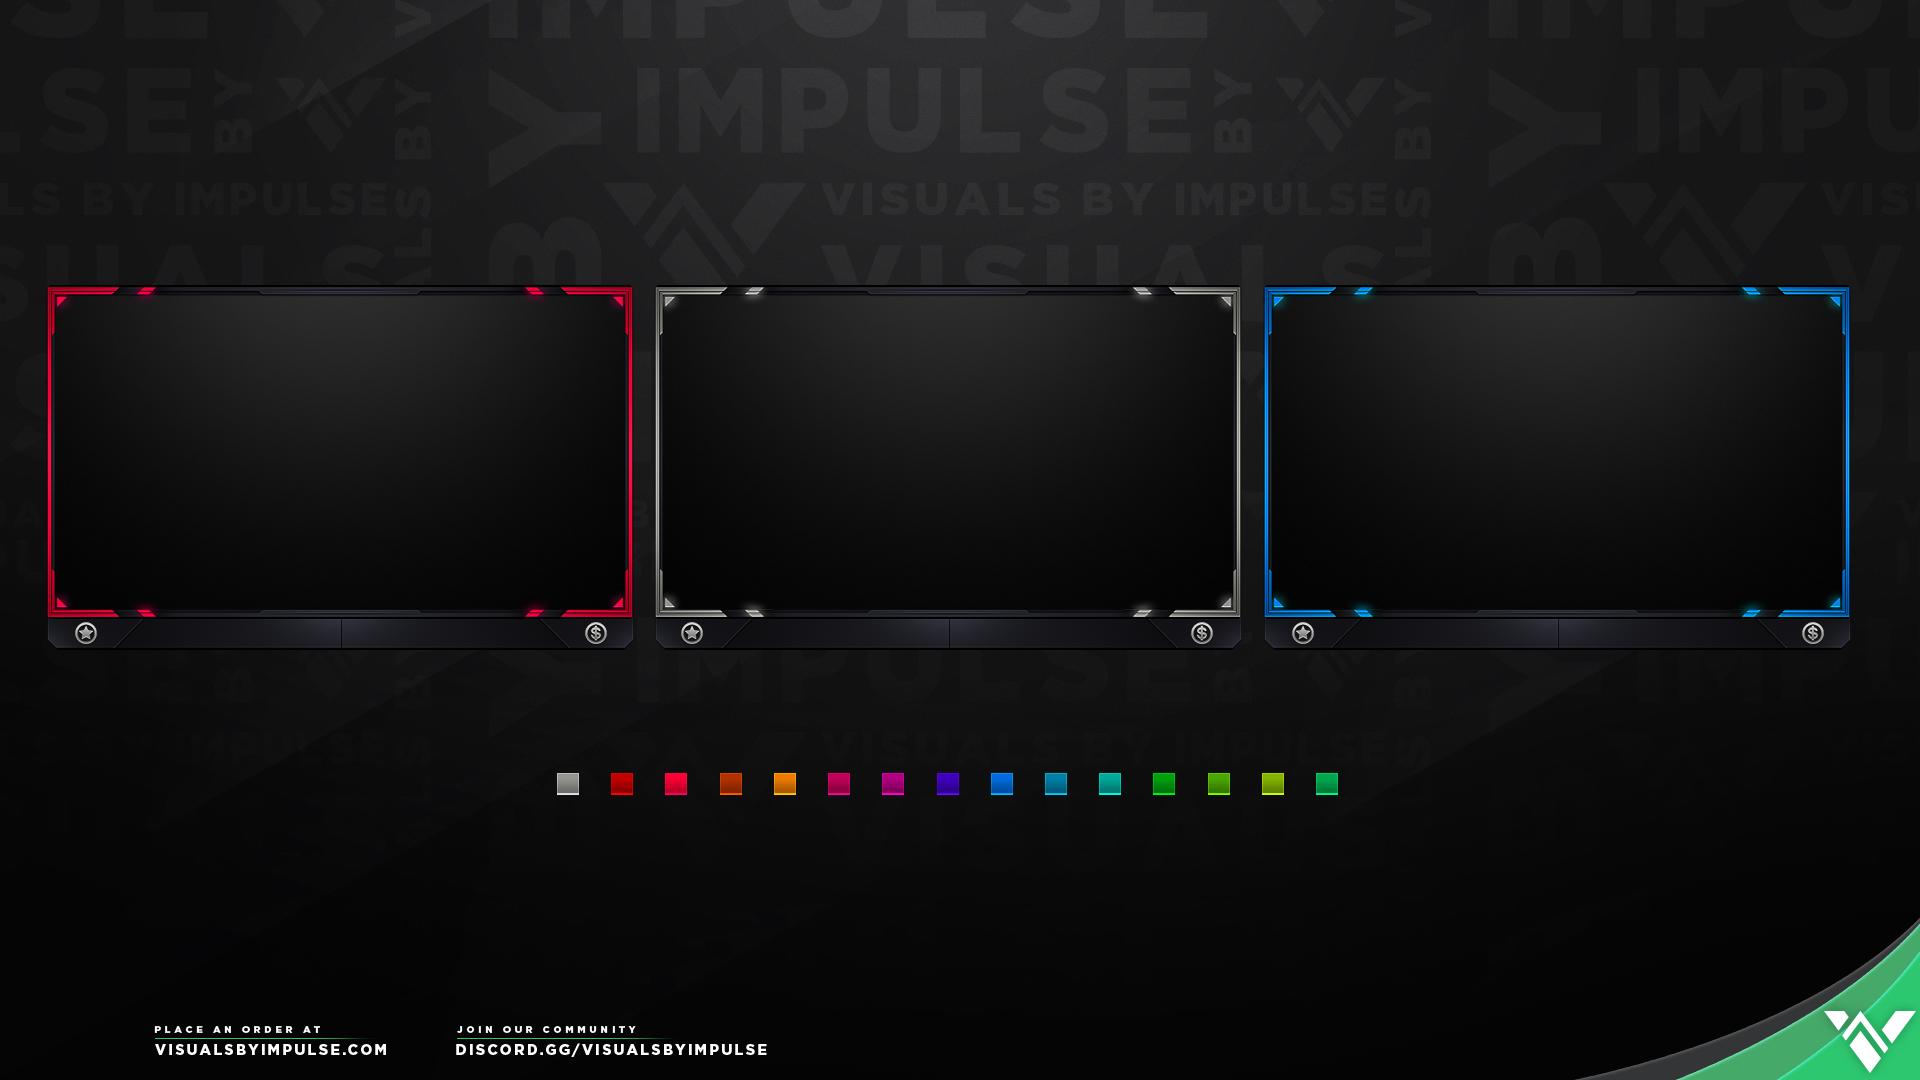 Free Champion Webcam Slot - Visuals by Impulse